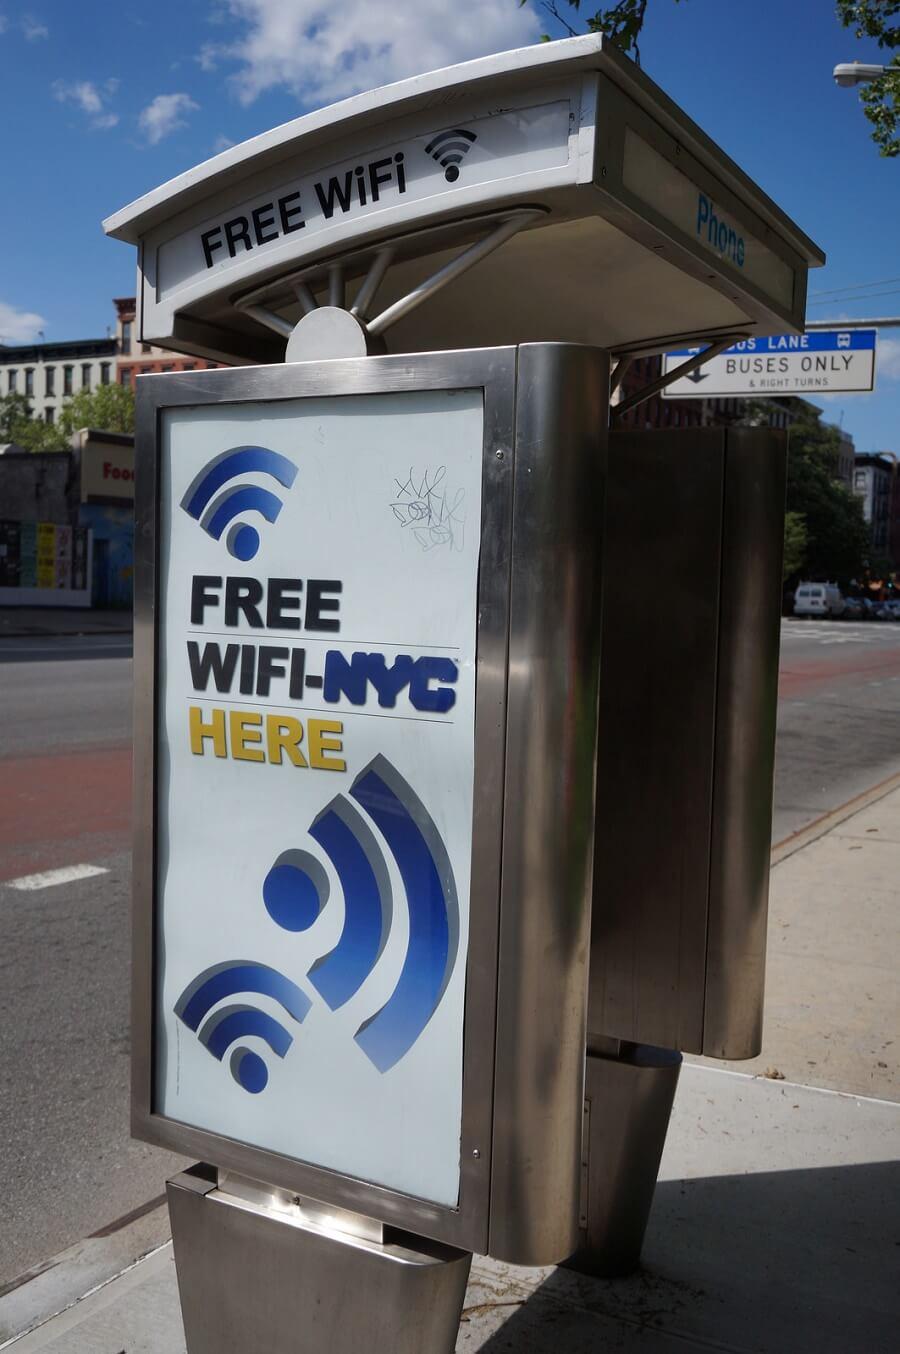 free wifi here